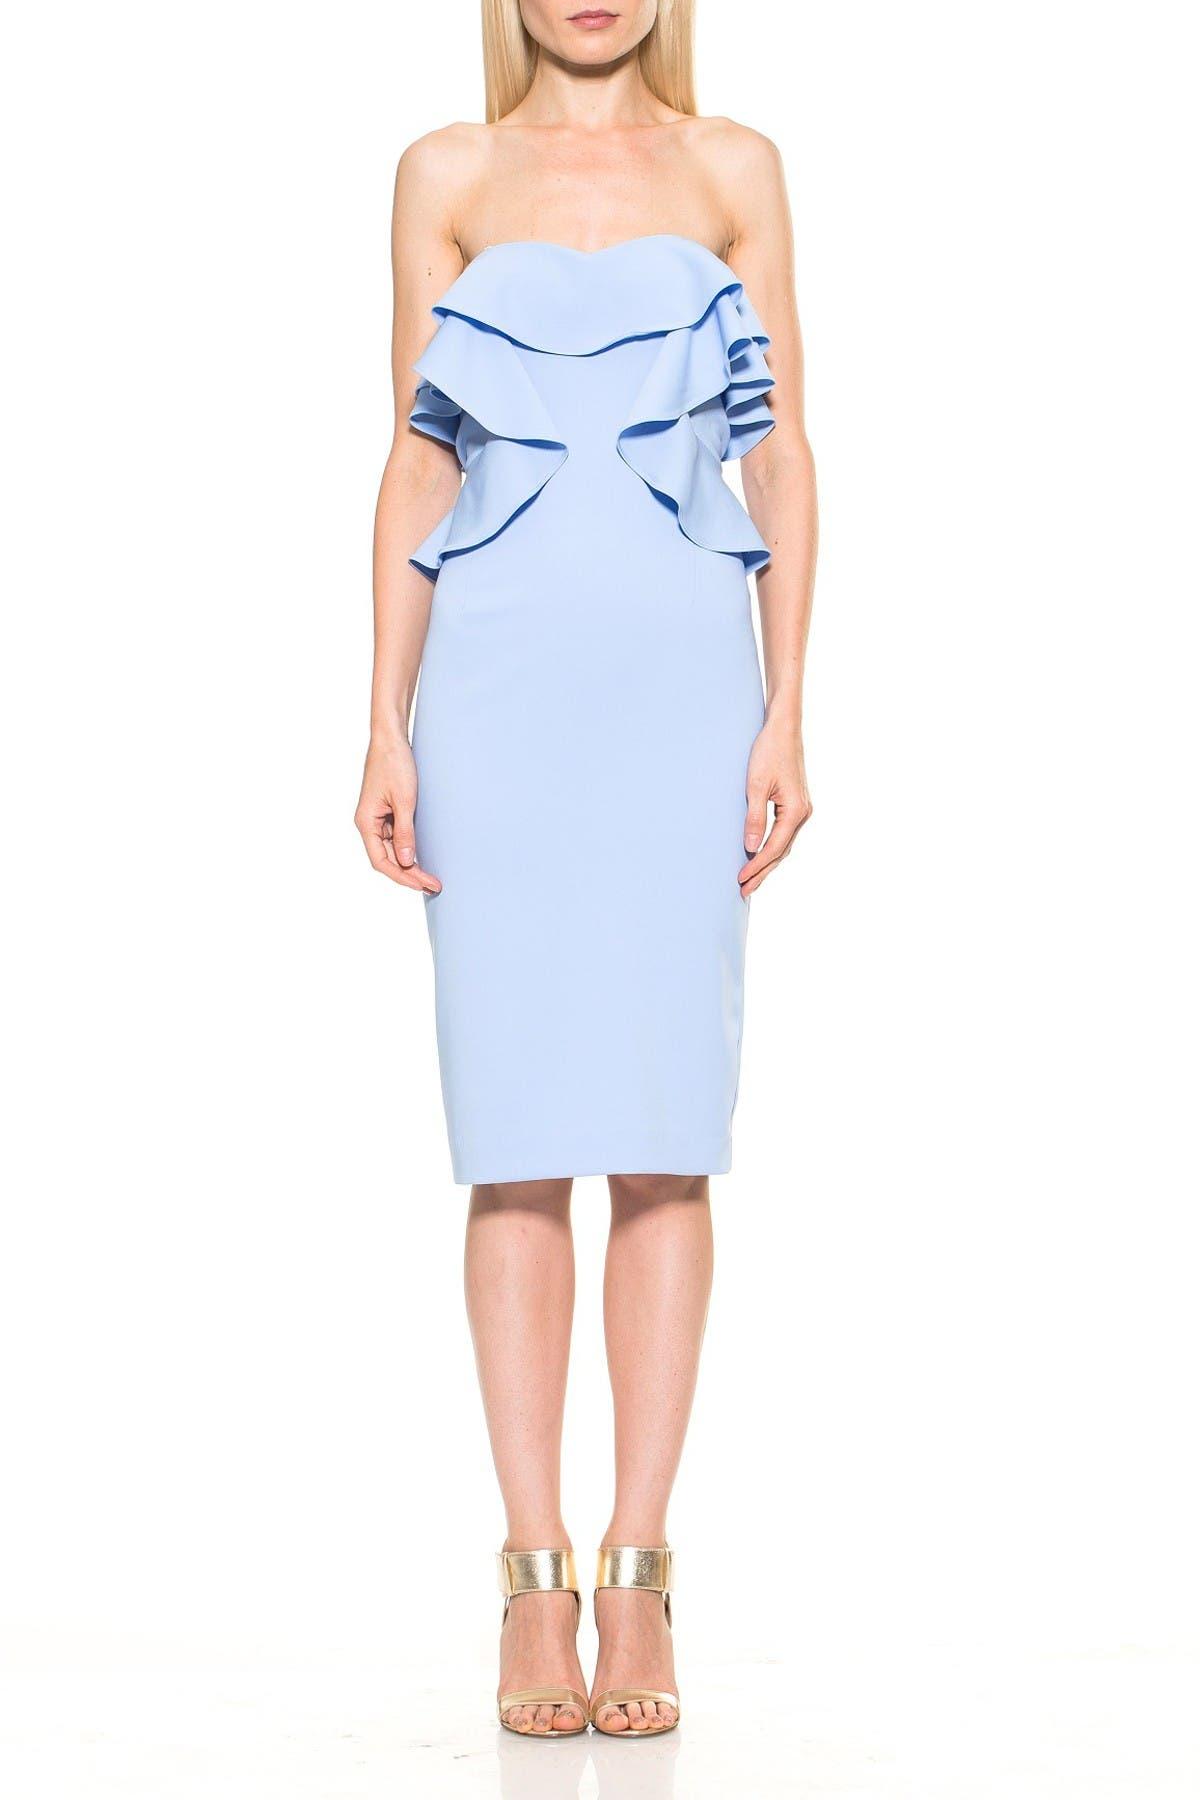 Image of Alexia Admor Strapless Ruffle Dress